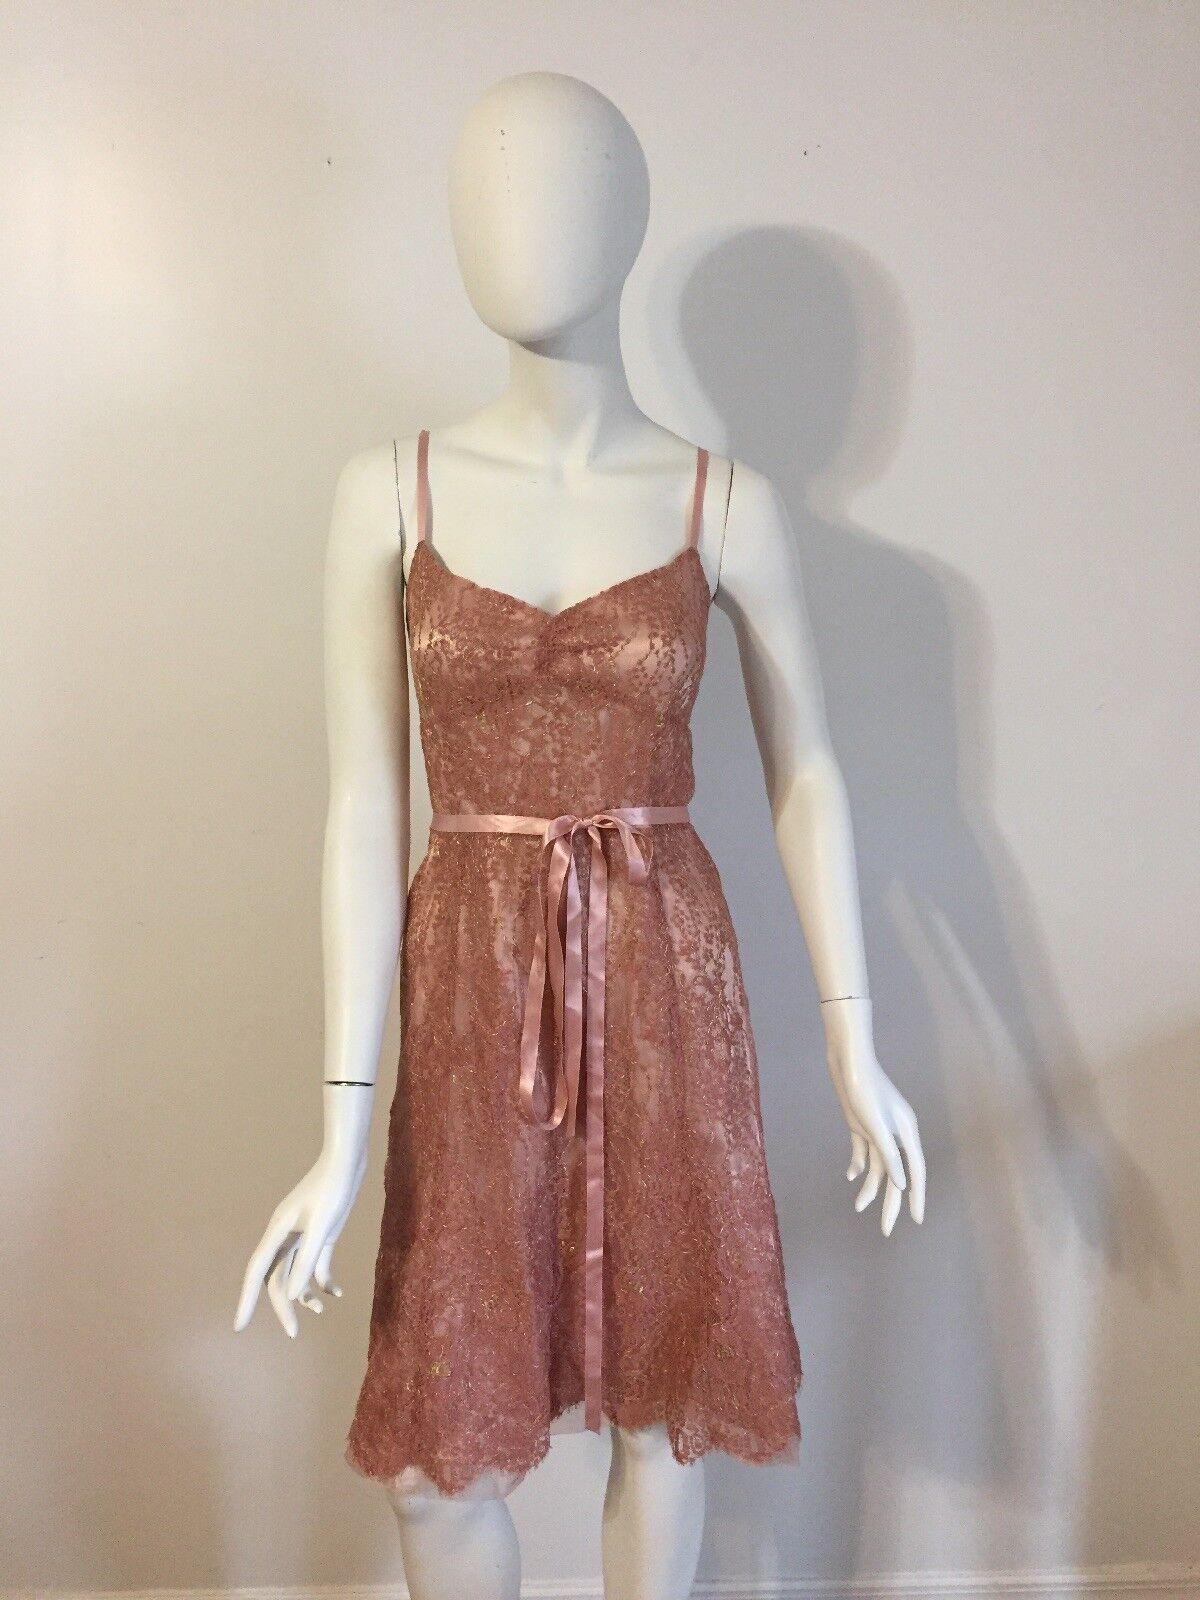 NWOT Ann Taylor Pink & gold Lace Dress Size 12P